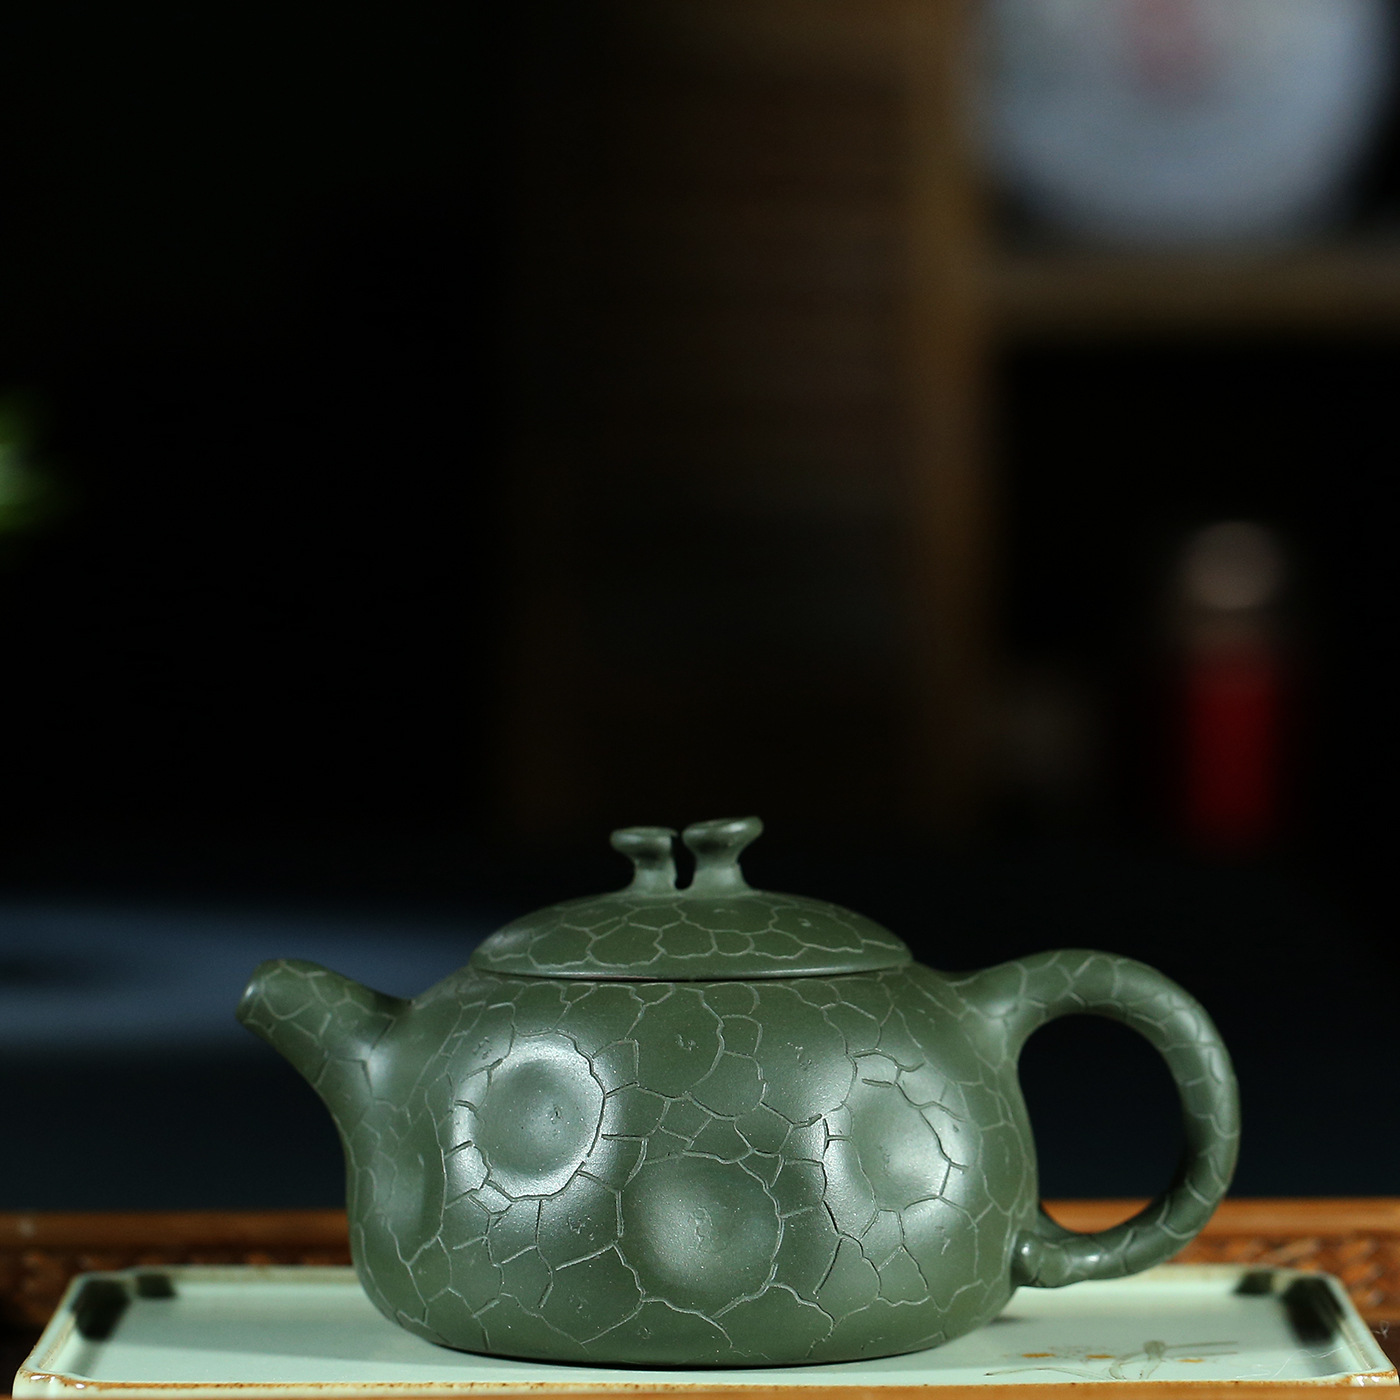 Yixing Teapot Quality Goods Famous Full Manual Raw Ore Green Mud Ganoderma Lucidum For Spring Pot Kungfu Online Teapot Tea SetYixing Teapot Quality Goods Famous Full Manual Raw Ore Green Mud Ganoderma Lucidum For Spring Pot Kungfu Online Teapot Tea Set